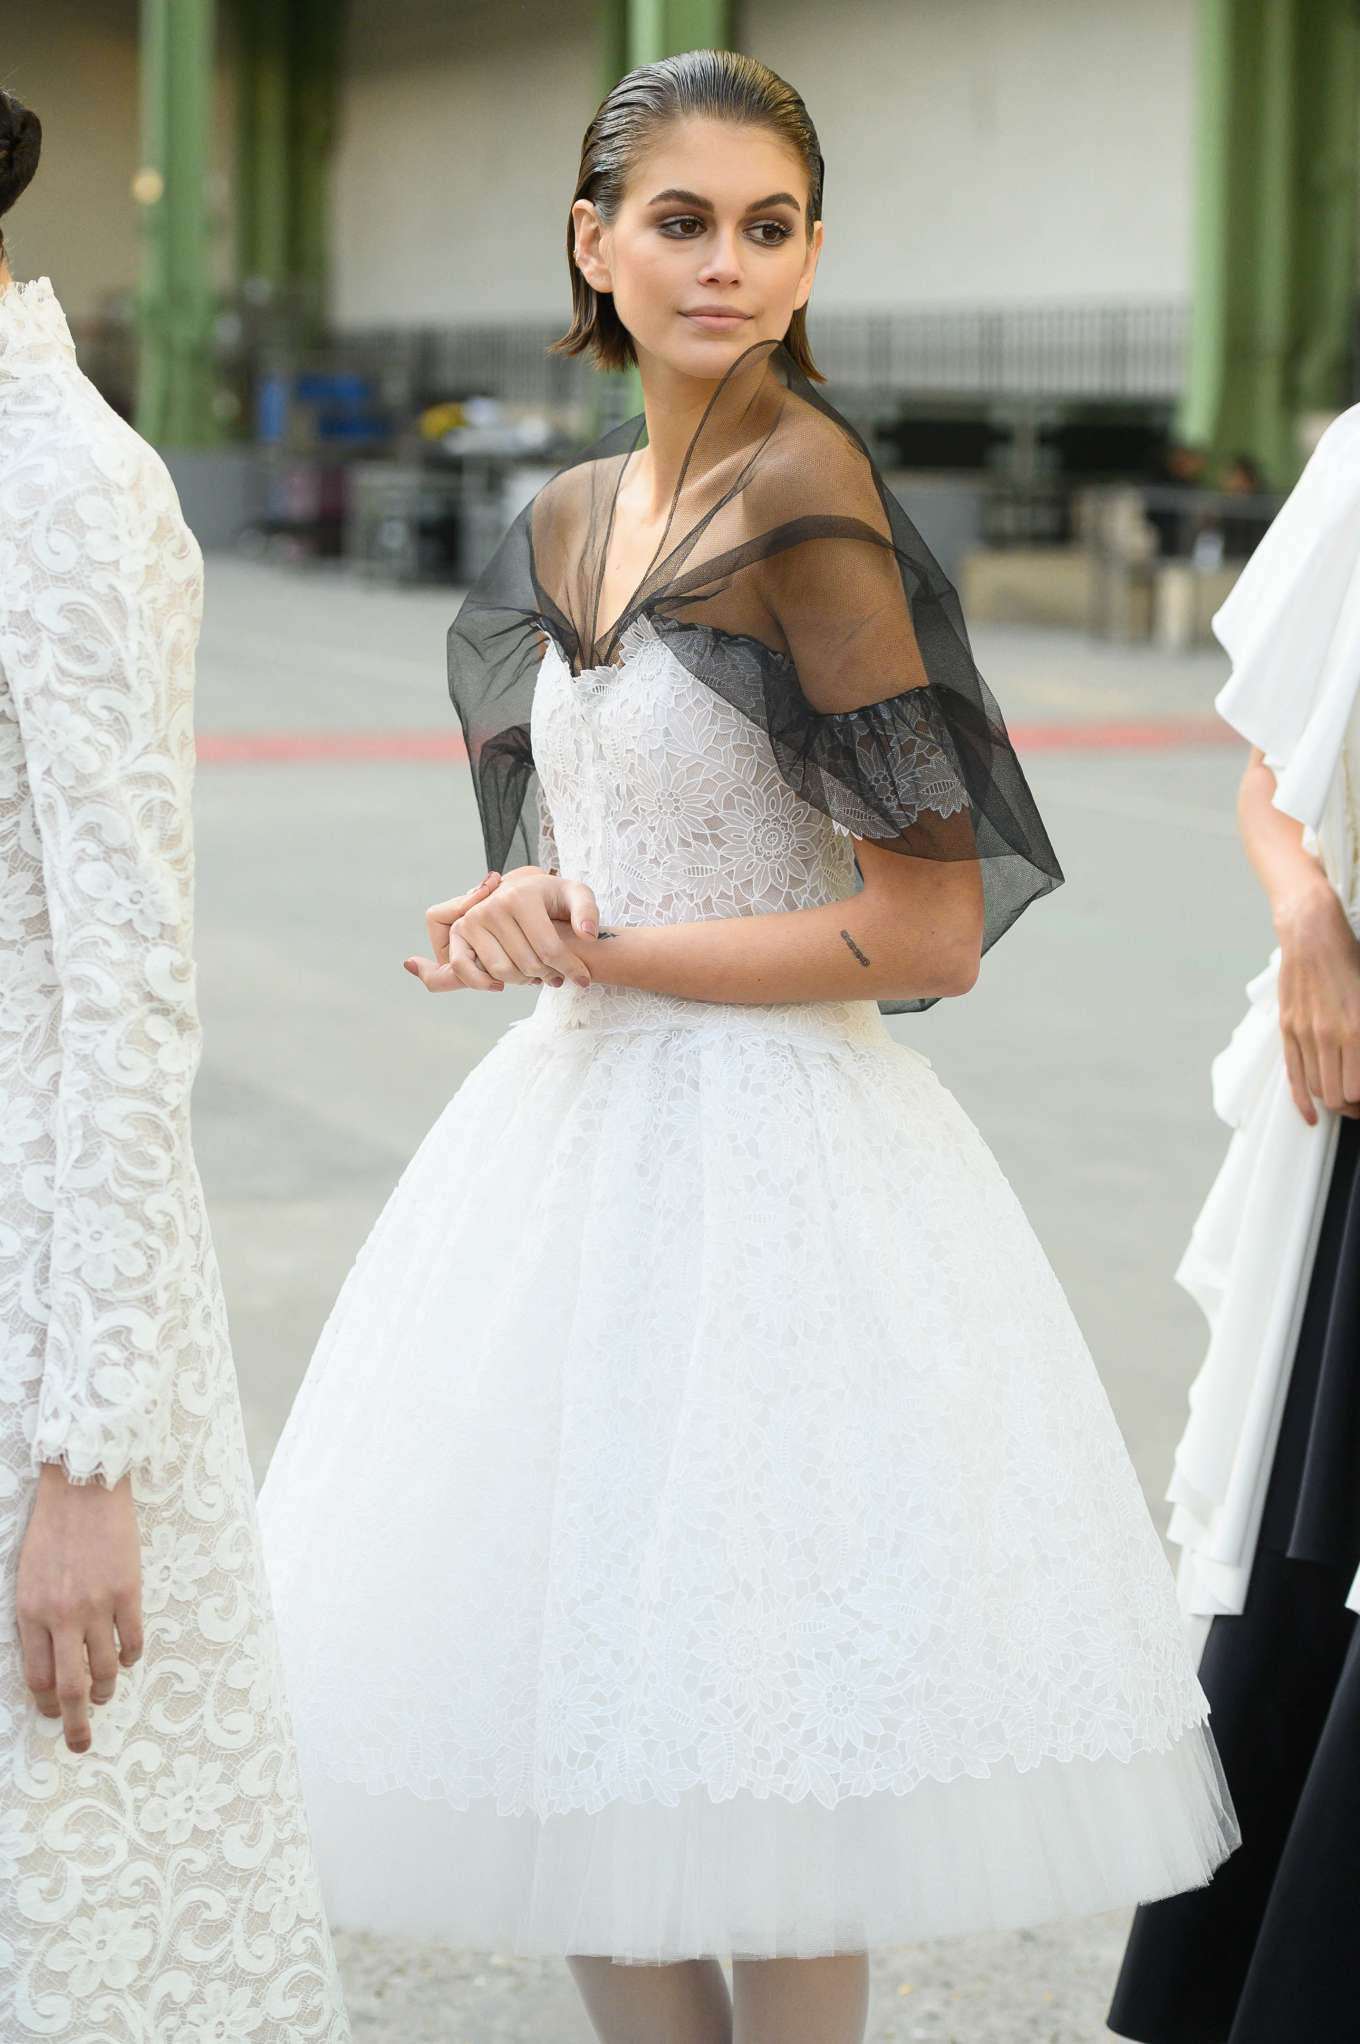 Kaia Gerber 2020 : Kaia Gerber – Chanel Haute Couture Backstage Show in Paris-27